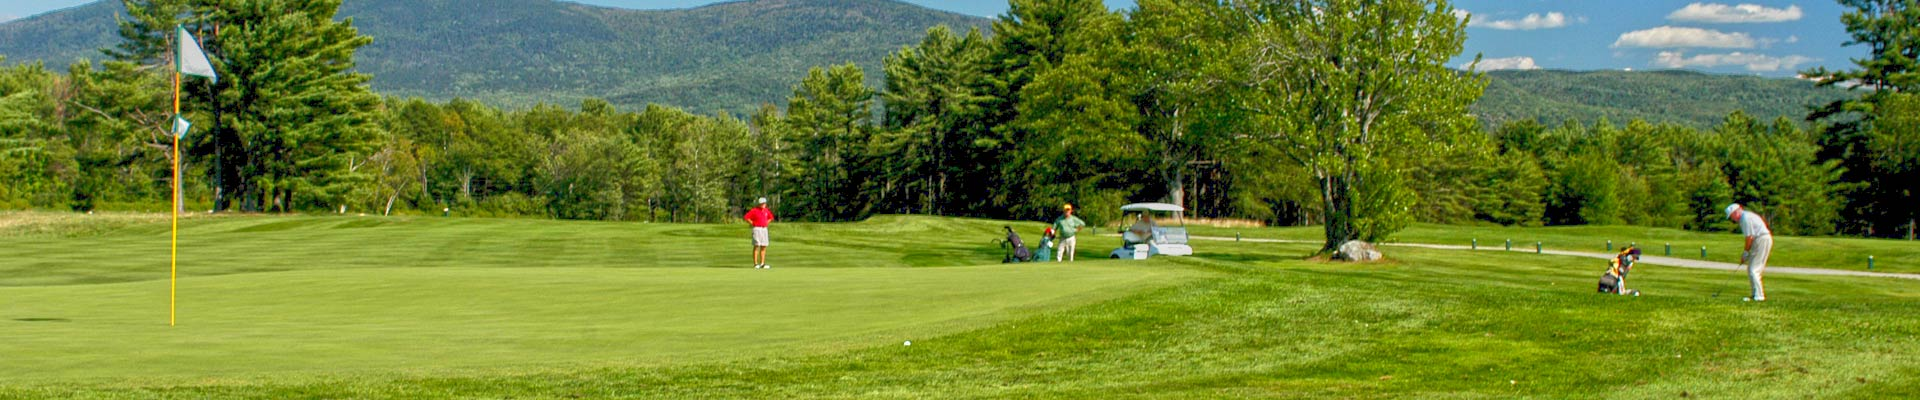 Quid Pro Quo Golf Tournament 2018 Lake Sunapee Country Club